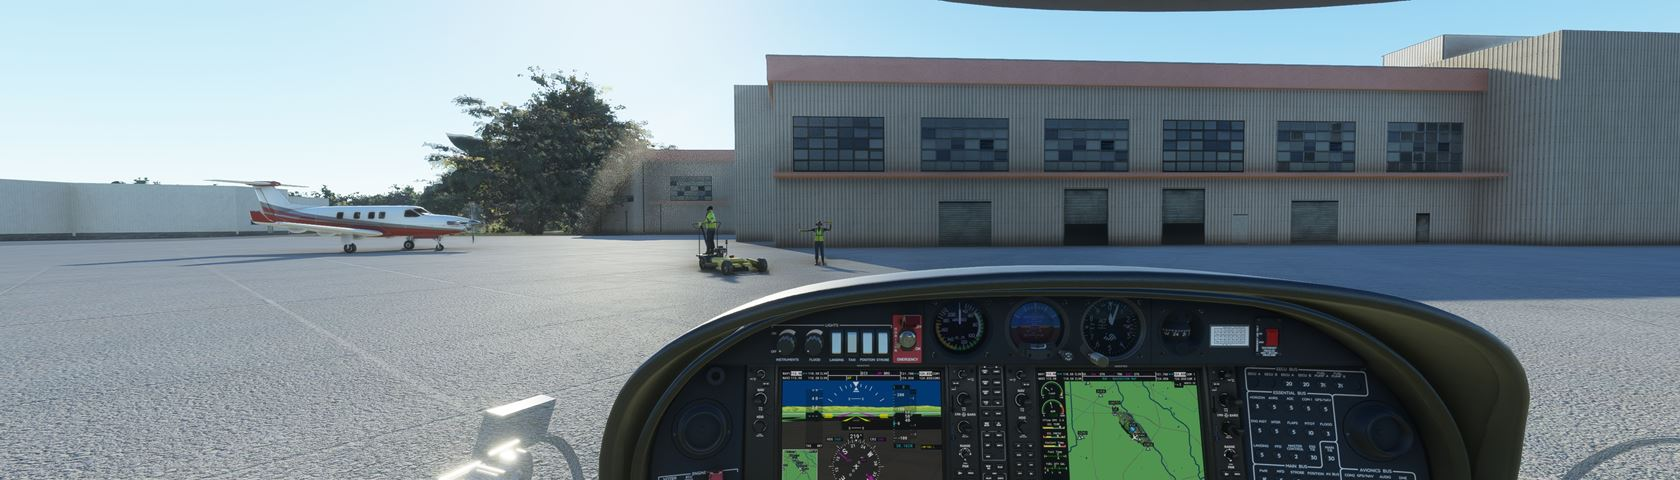 FS2020 Airport Parking